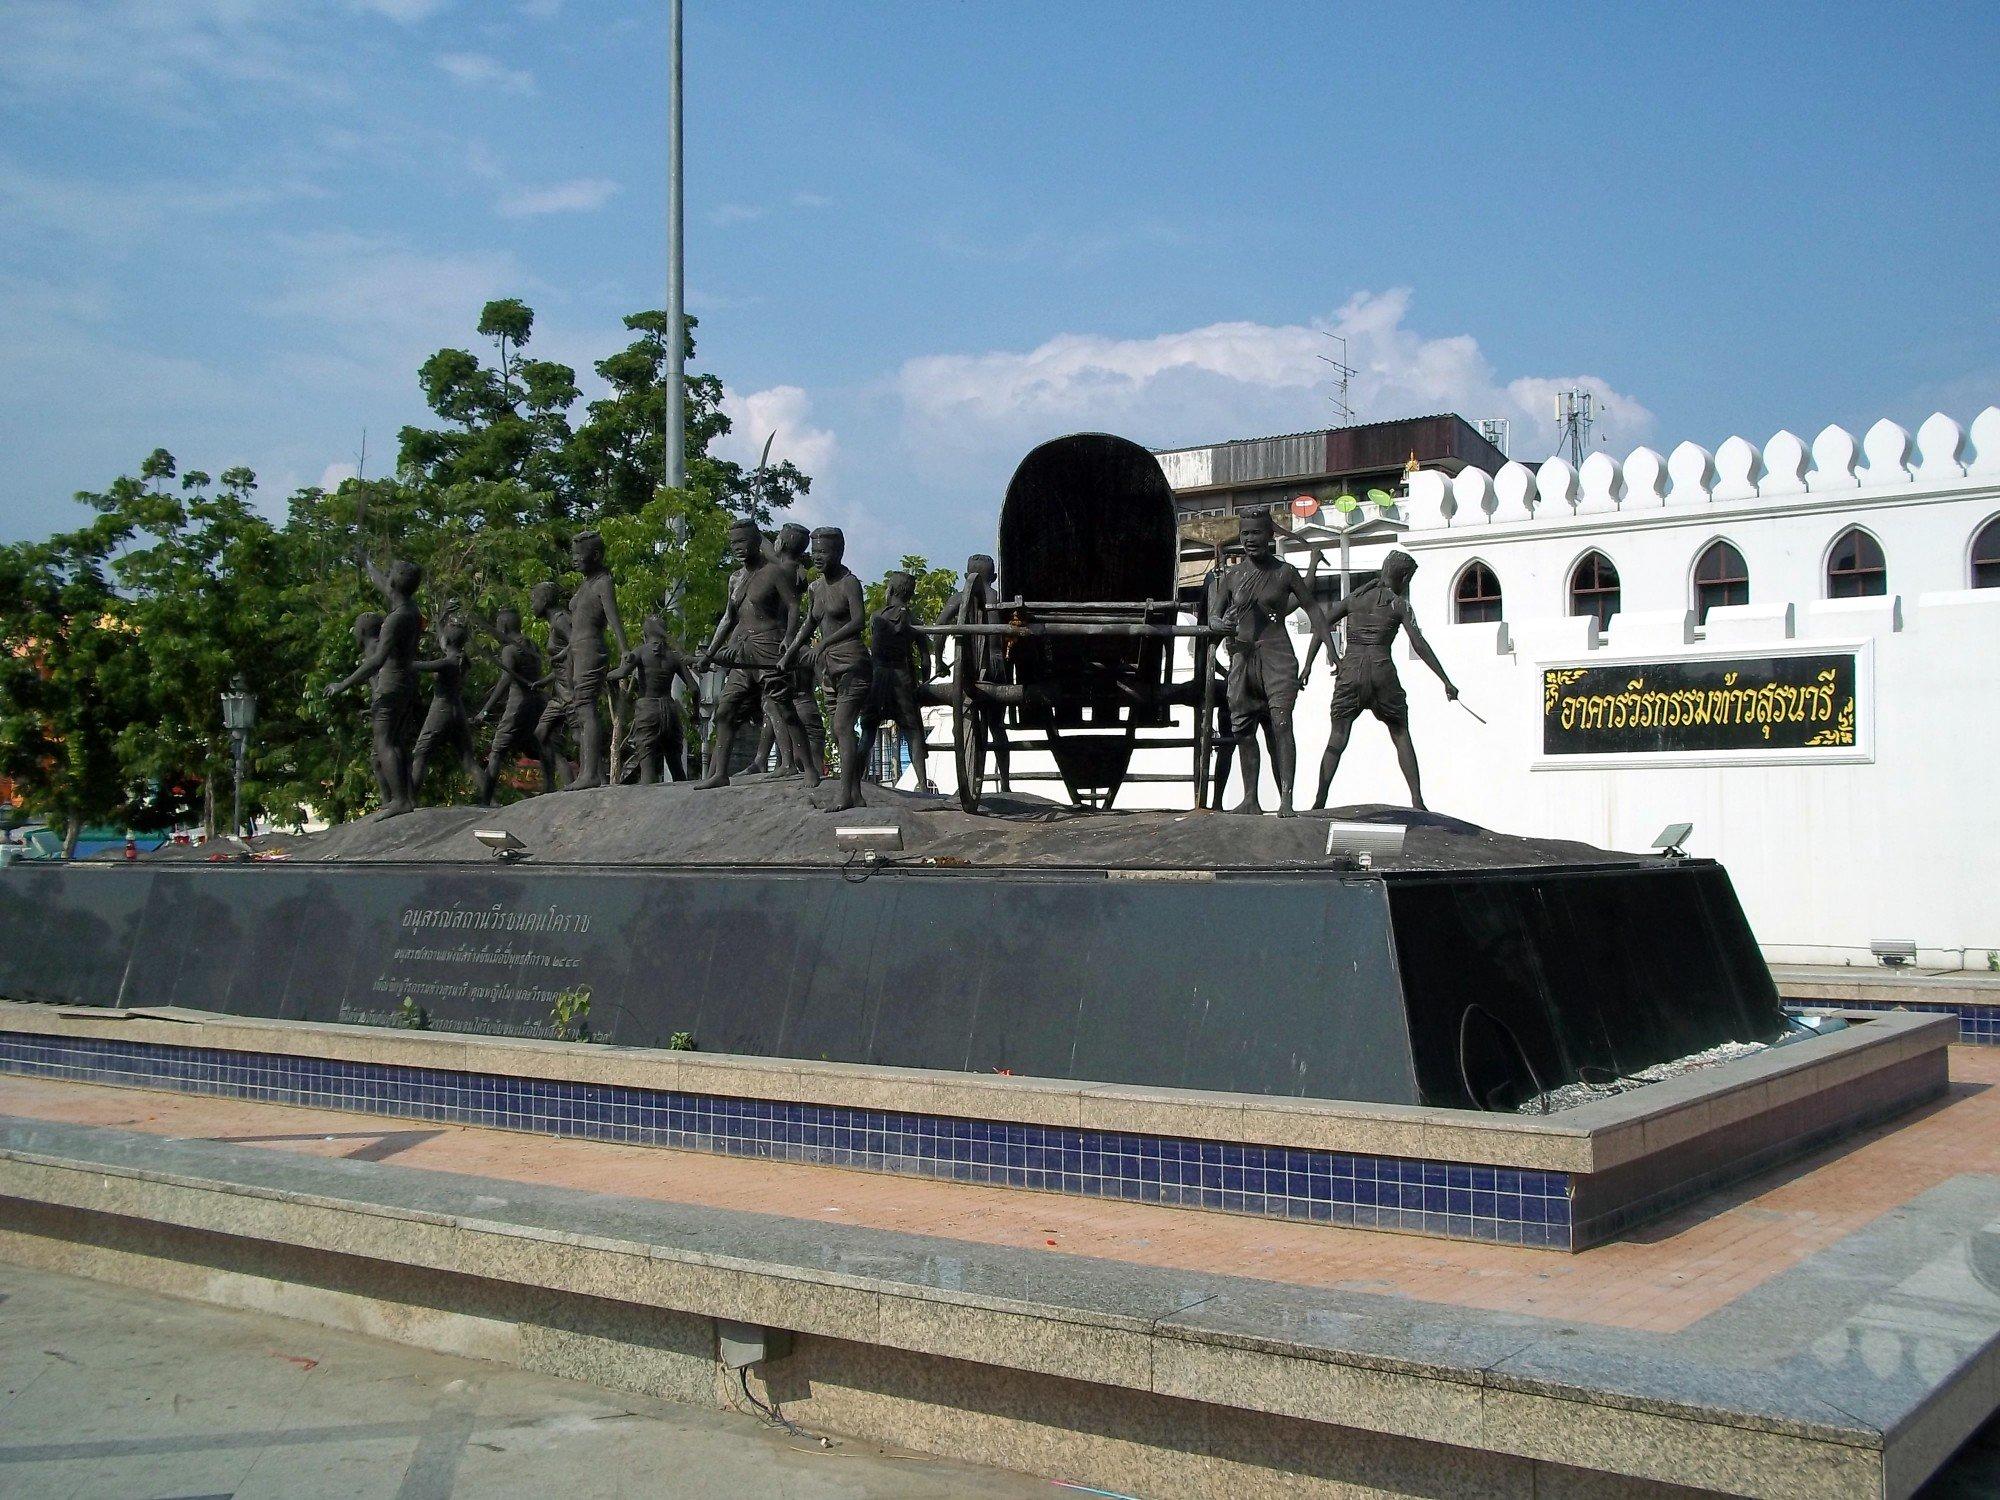 Suan Rak Park in Nakhon Ratchasima